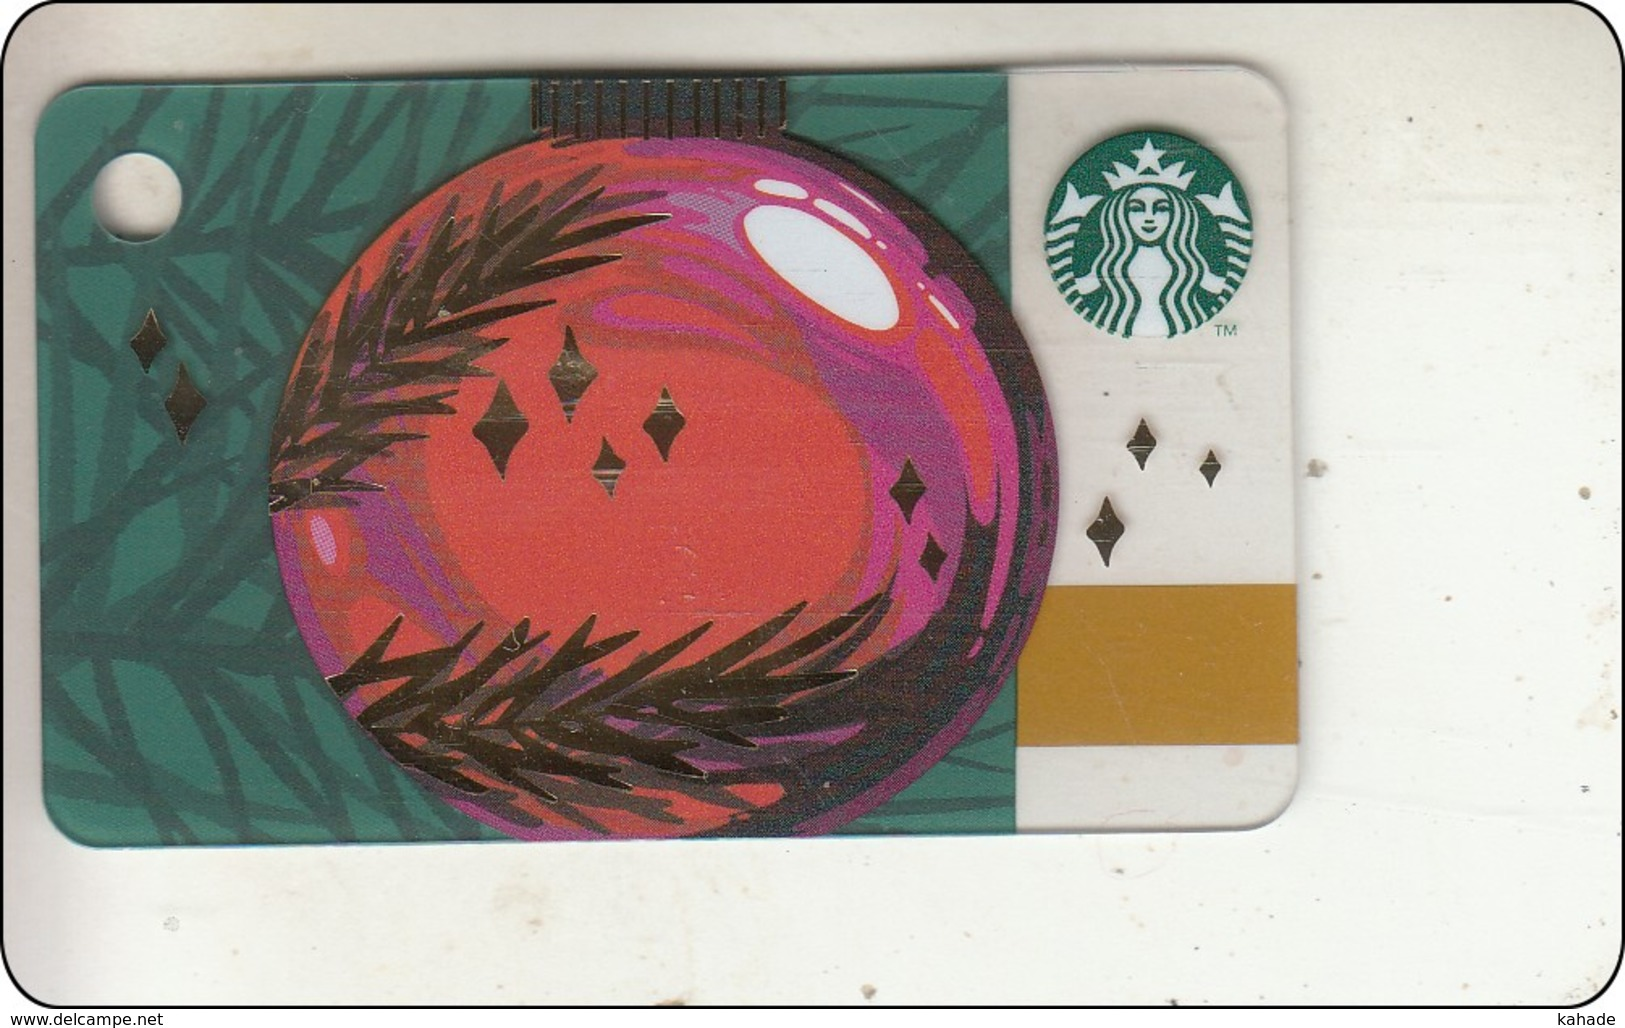 Thailand Starbucks Card Christmas Ball Mini 2018 - 6156 - Gift Cards